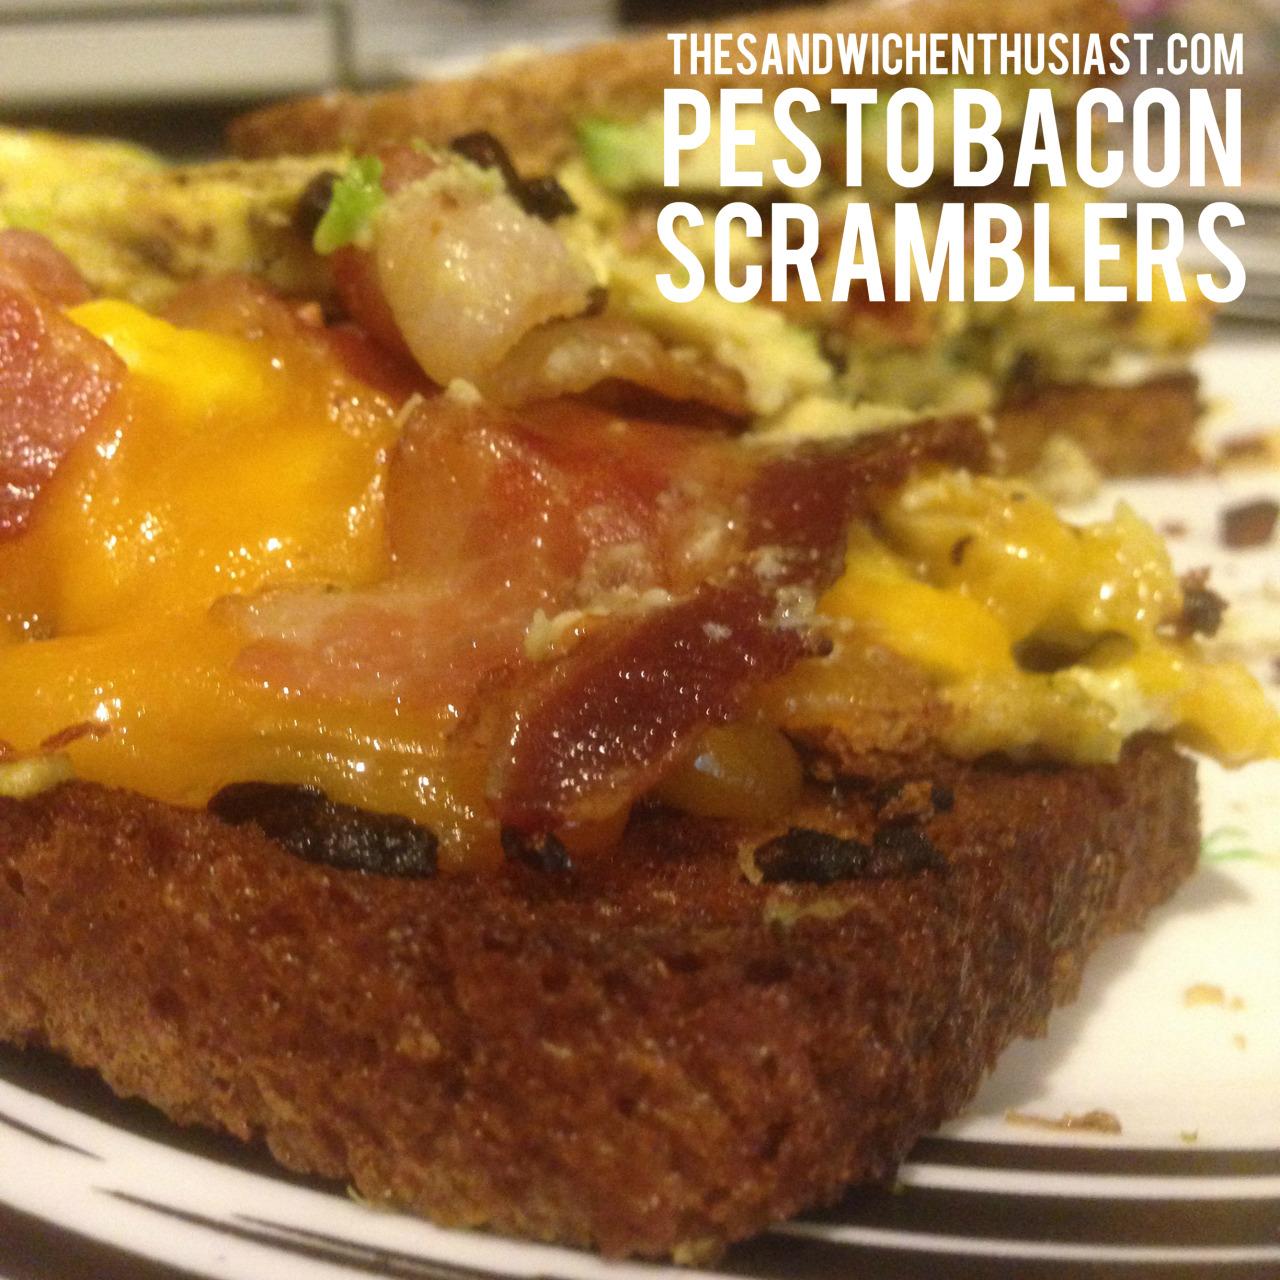 pestobaconscramblers